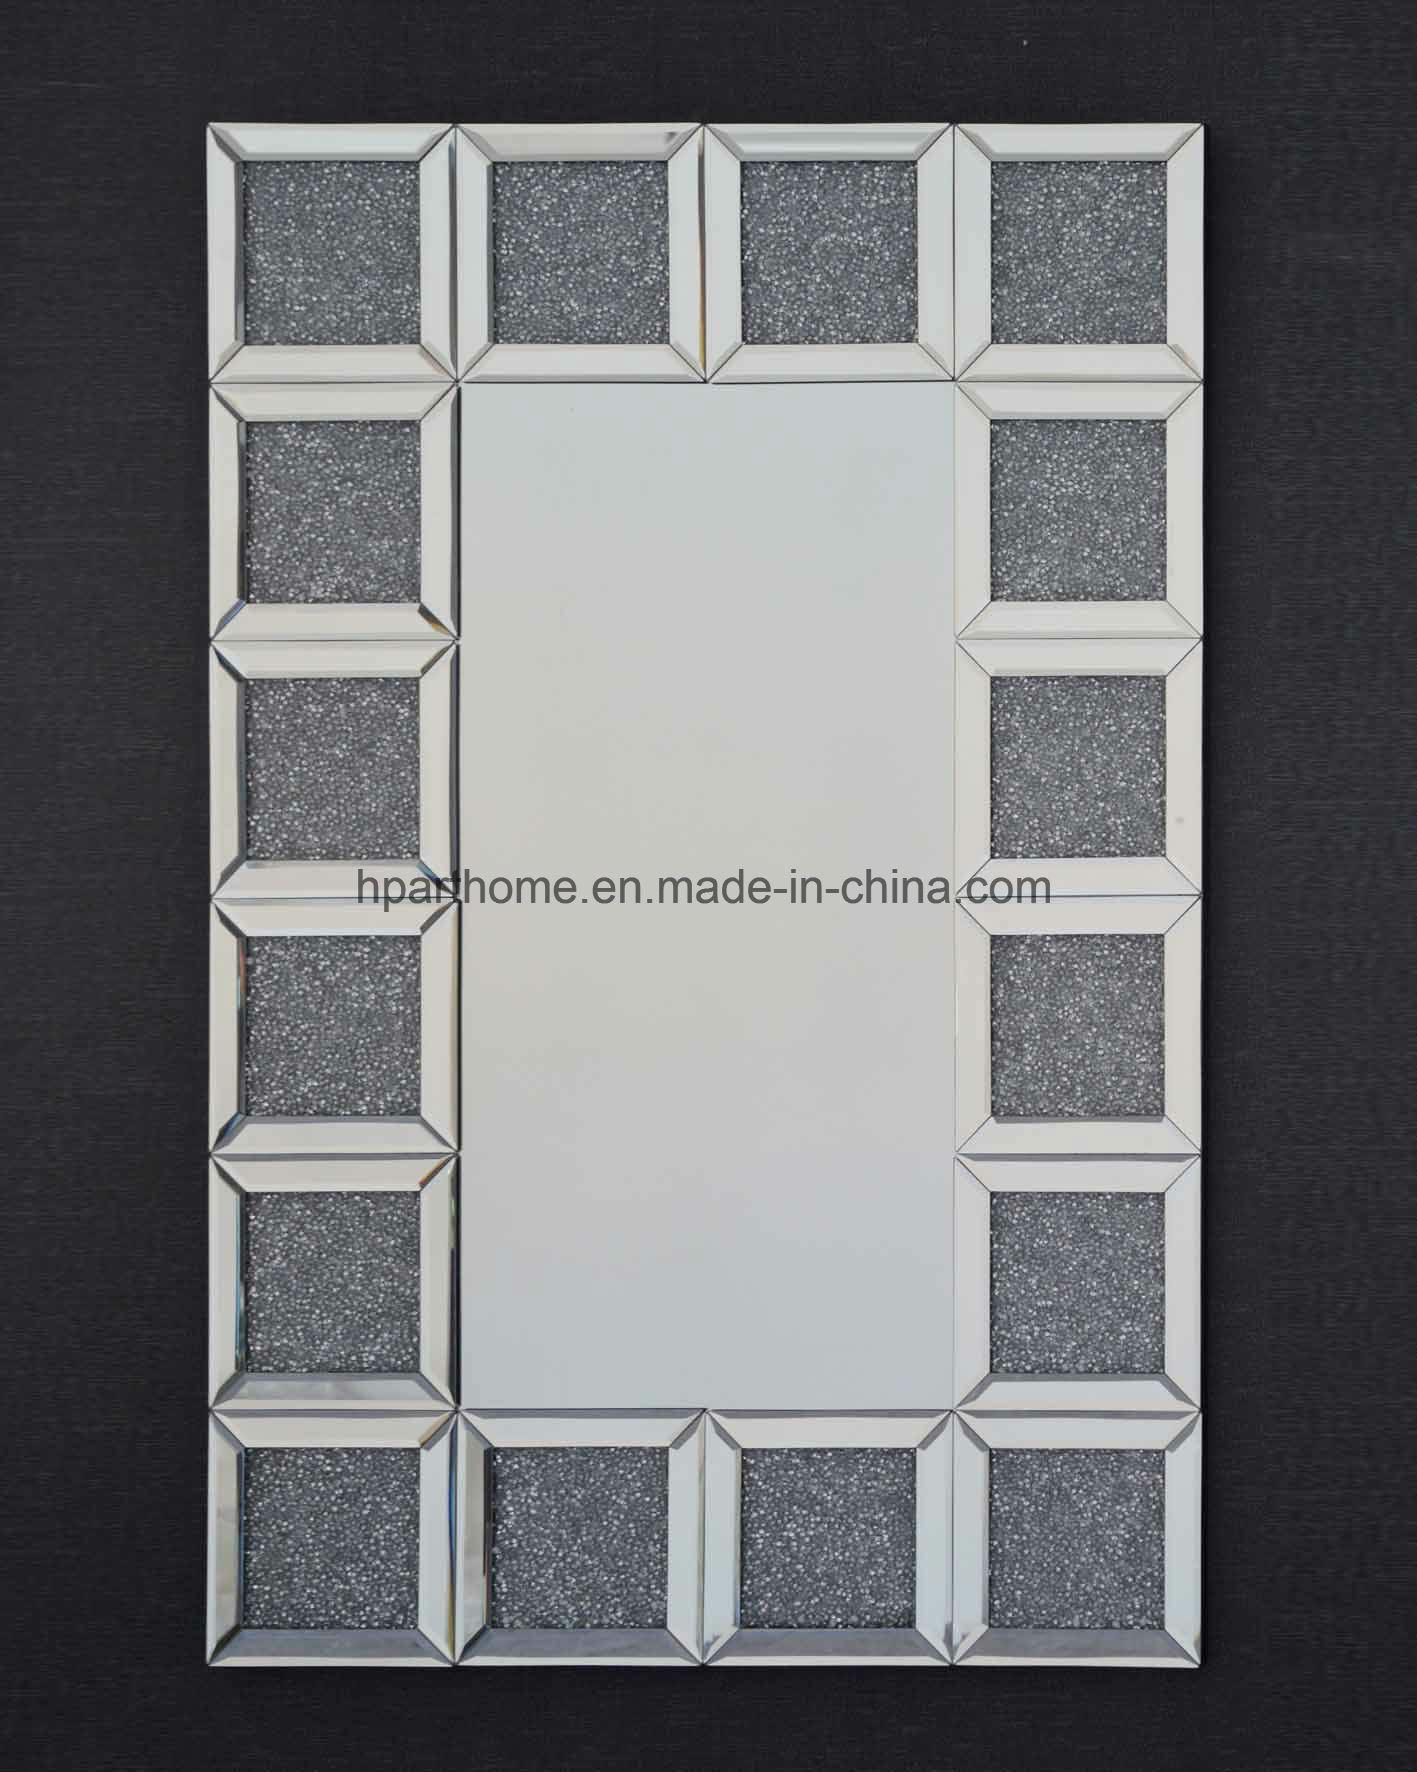 China Hot Silver Crushed Diamond Crystal Wall Mirrors Mirror